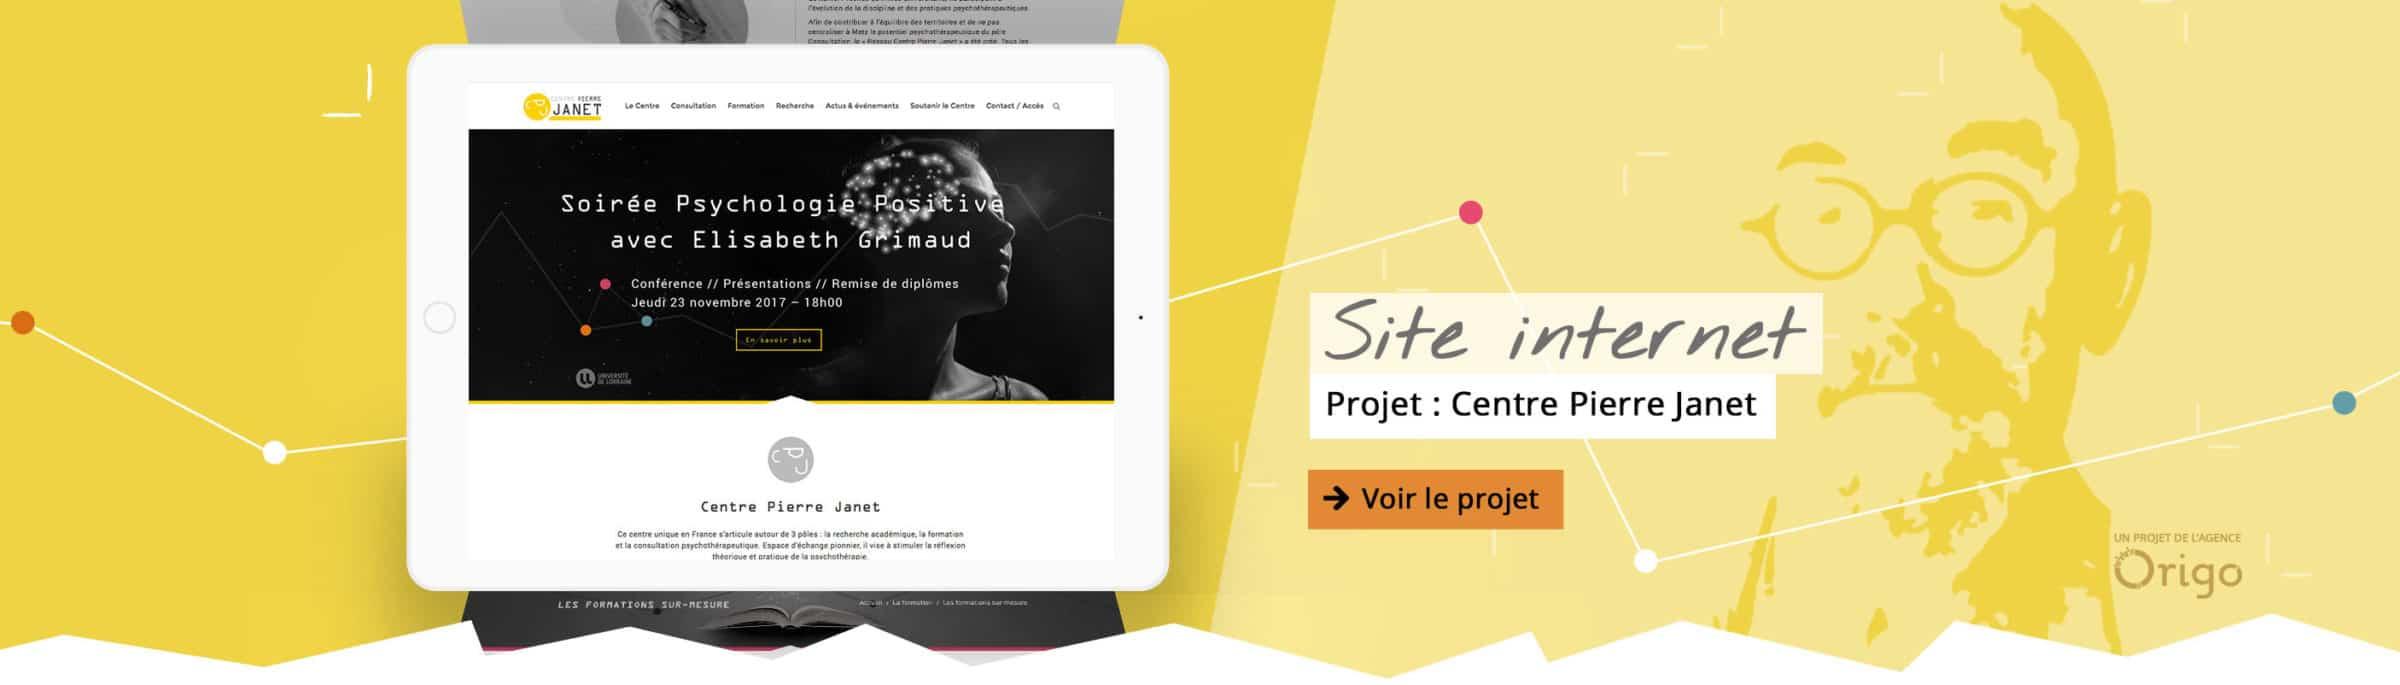 Graphisme de site internet responsive